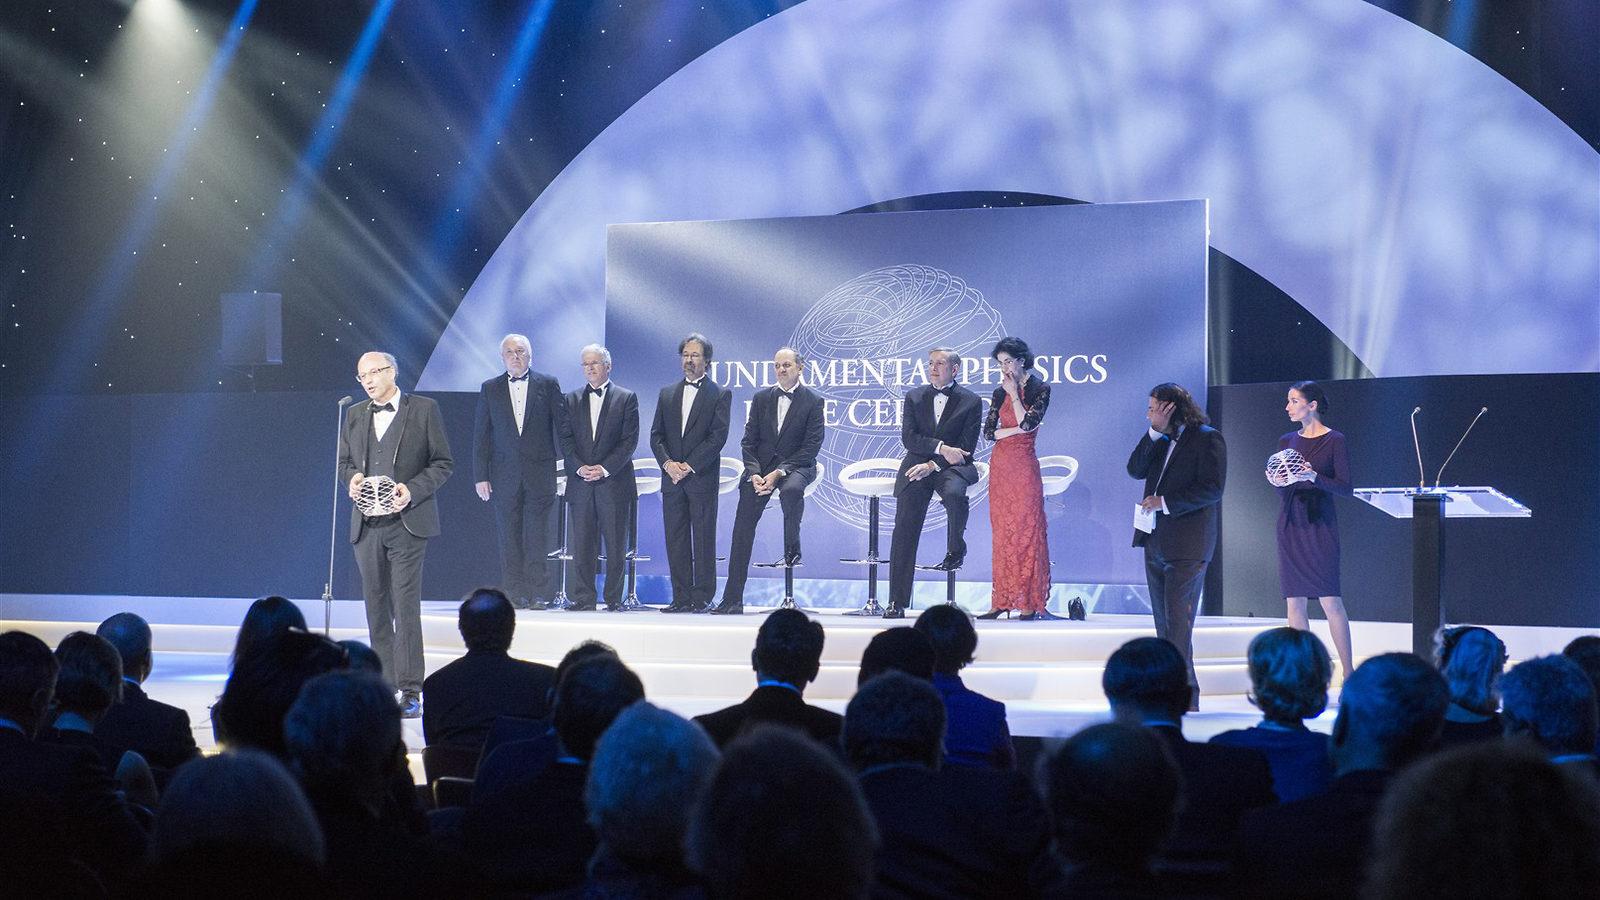 Photo of Fundamental Physics Prize ceremony